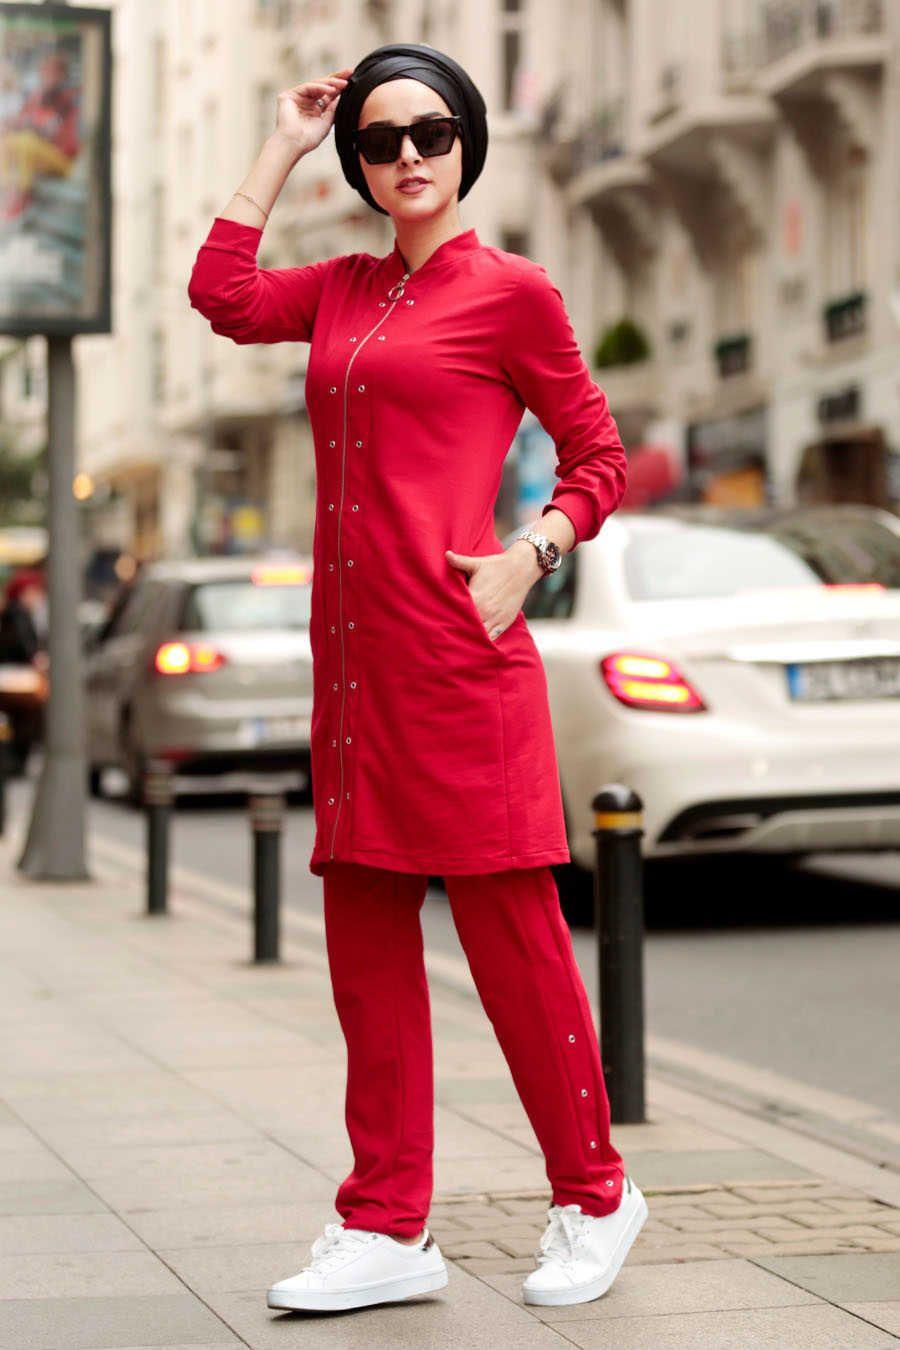 Neva Style Red Hijab Suit 2385k Neva Style Com Cute Outfits Fashion Red Fashion